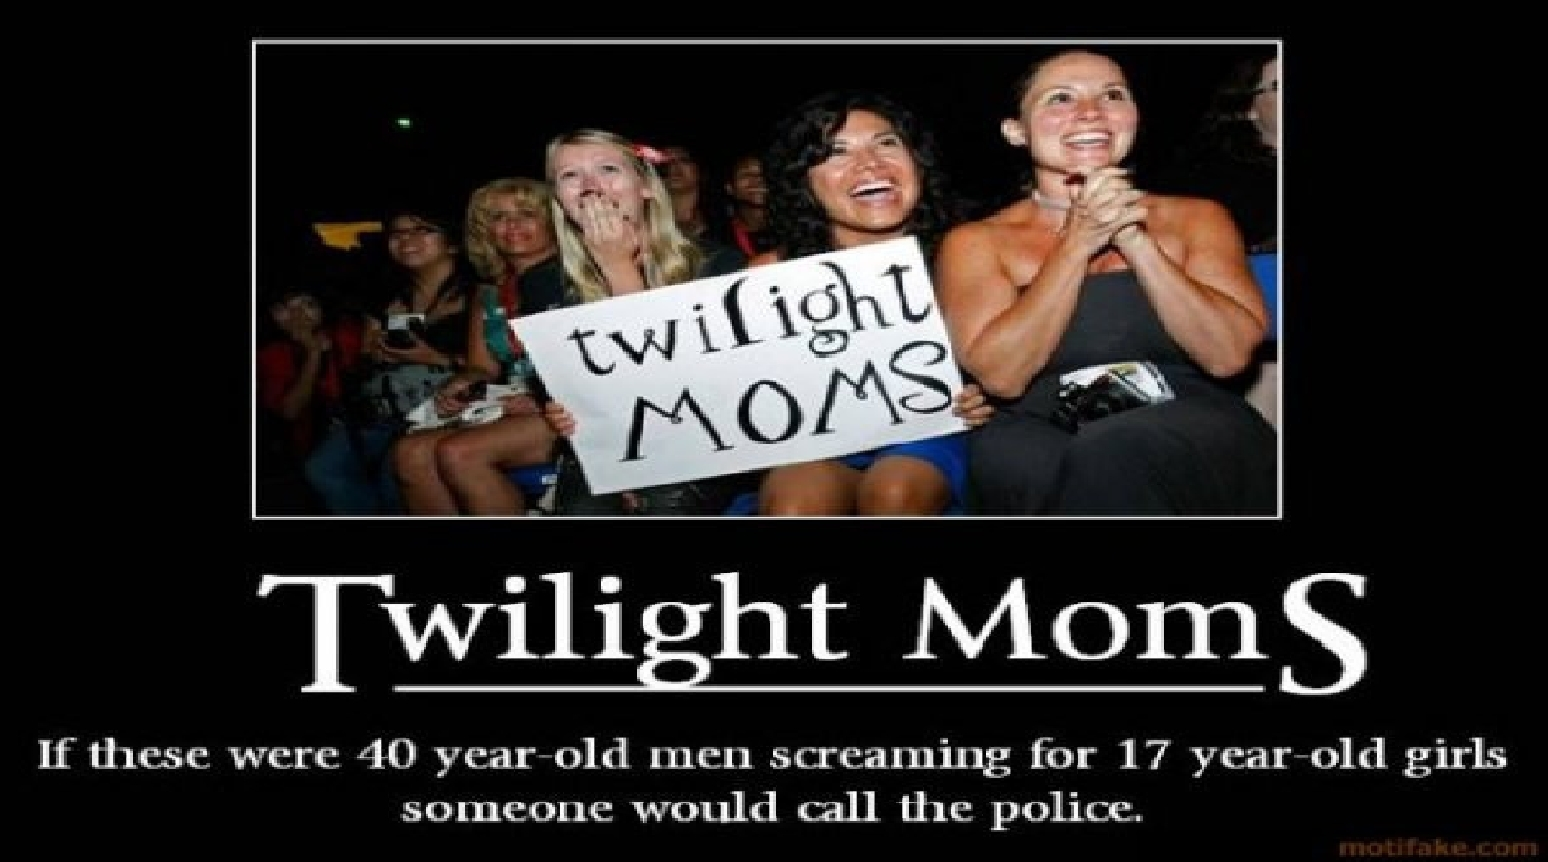 Twilight moms ( bottom is funny )